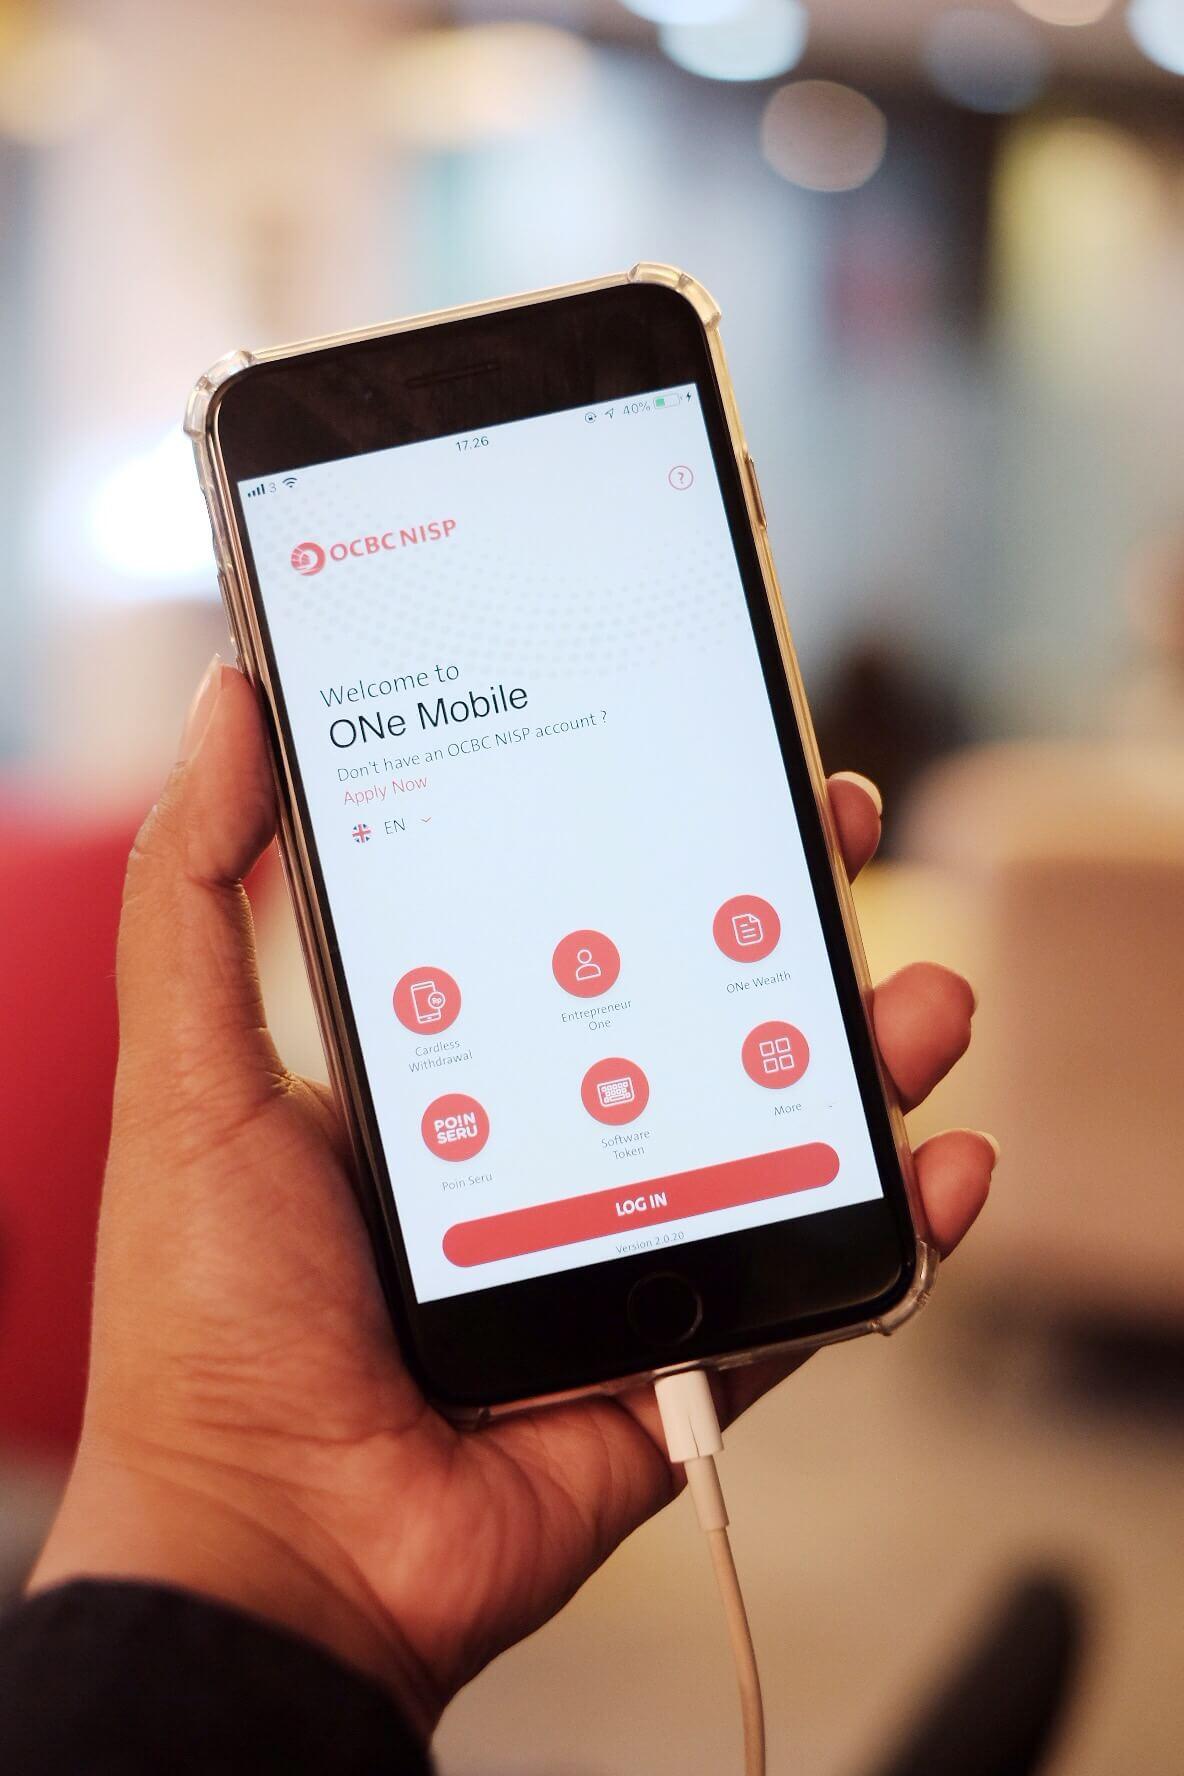 Online Banking – ONe Mobile dari OCBC NISP